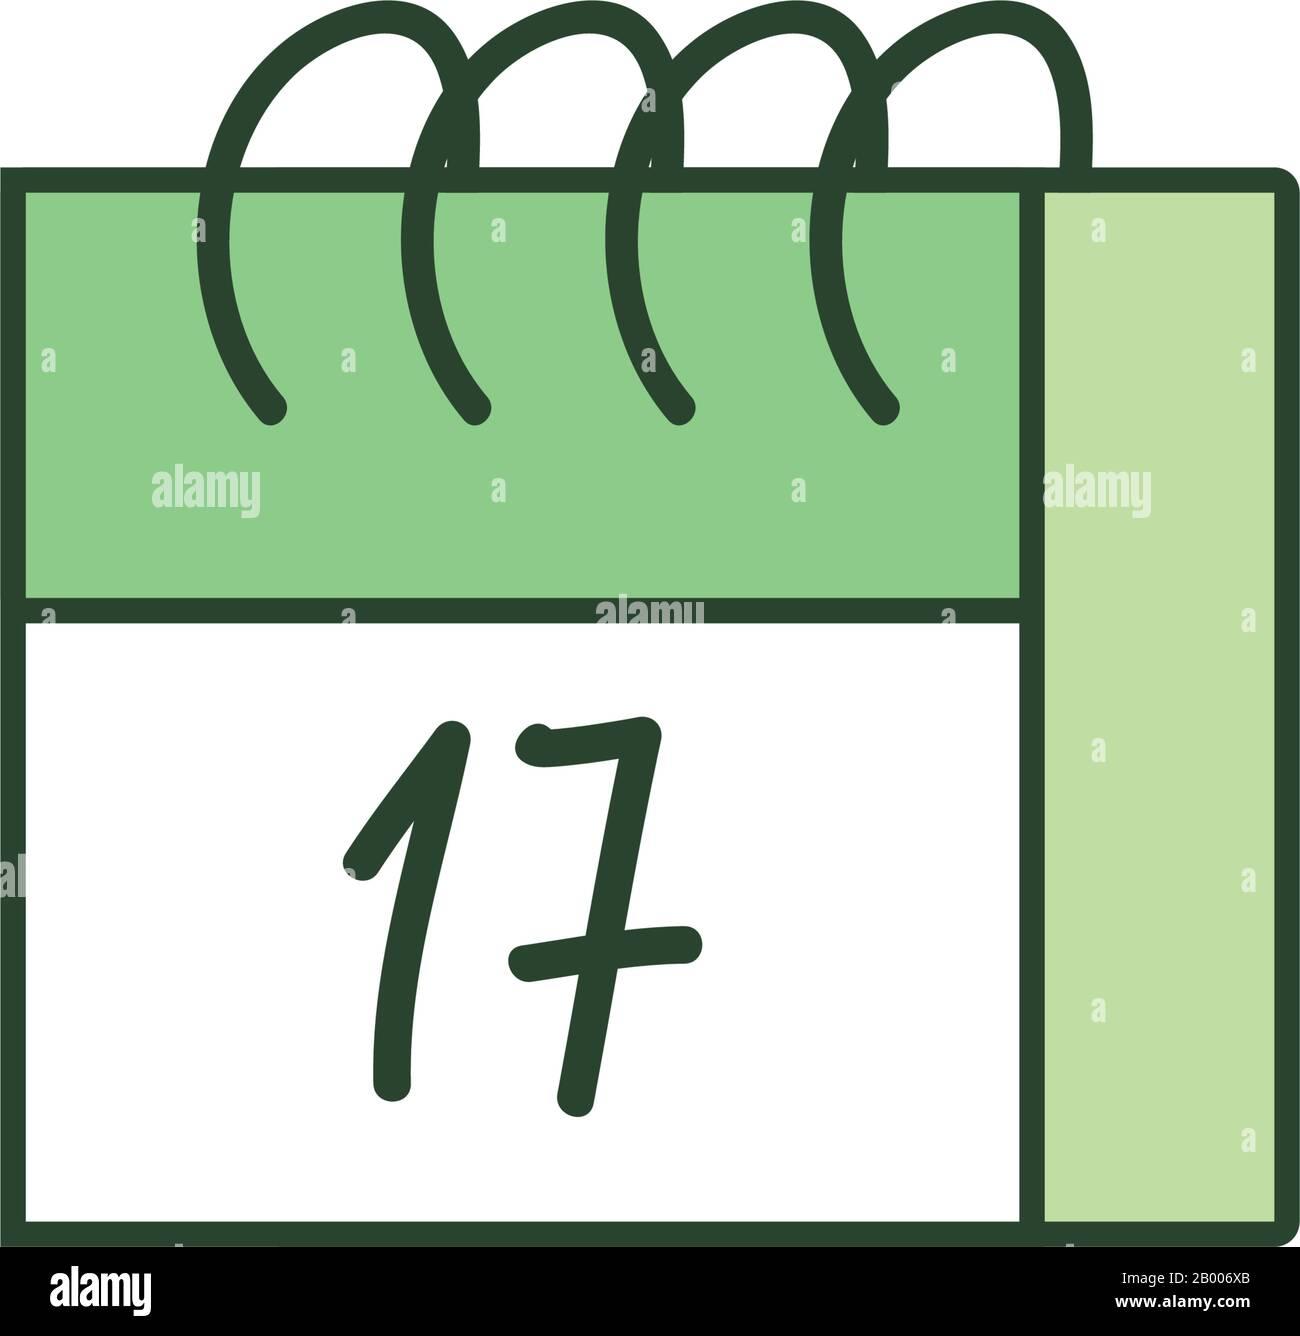 Calendar line style icon design, Saint patricks day ireland celebration fortune irish natural and lucky theme Vector illustration Stock Vector